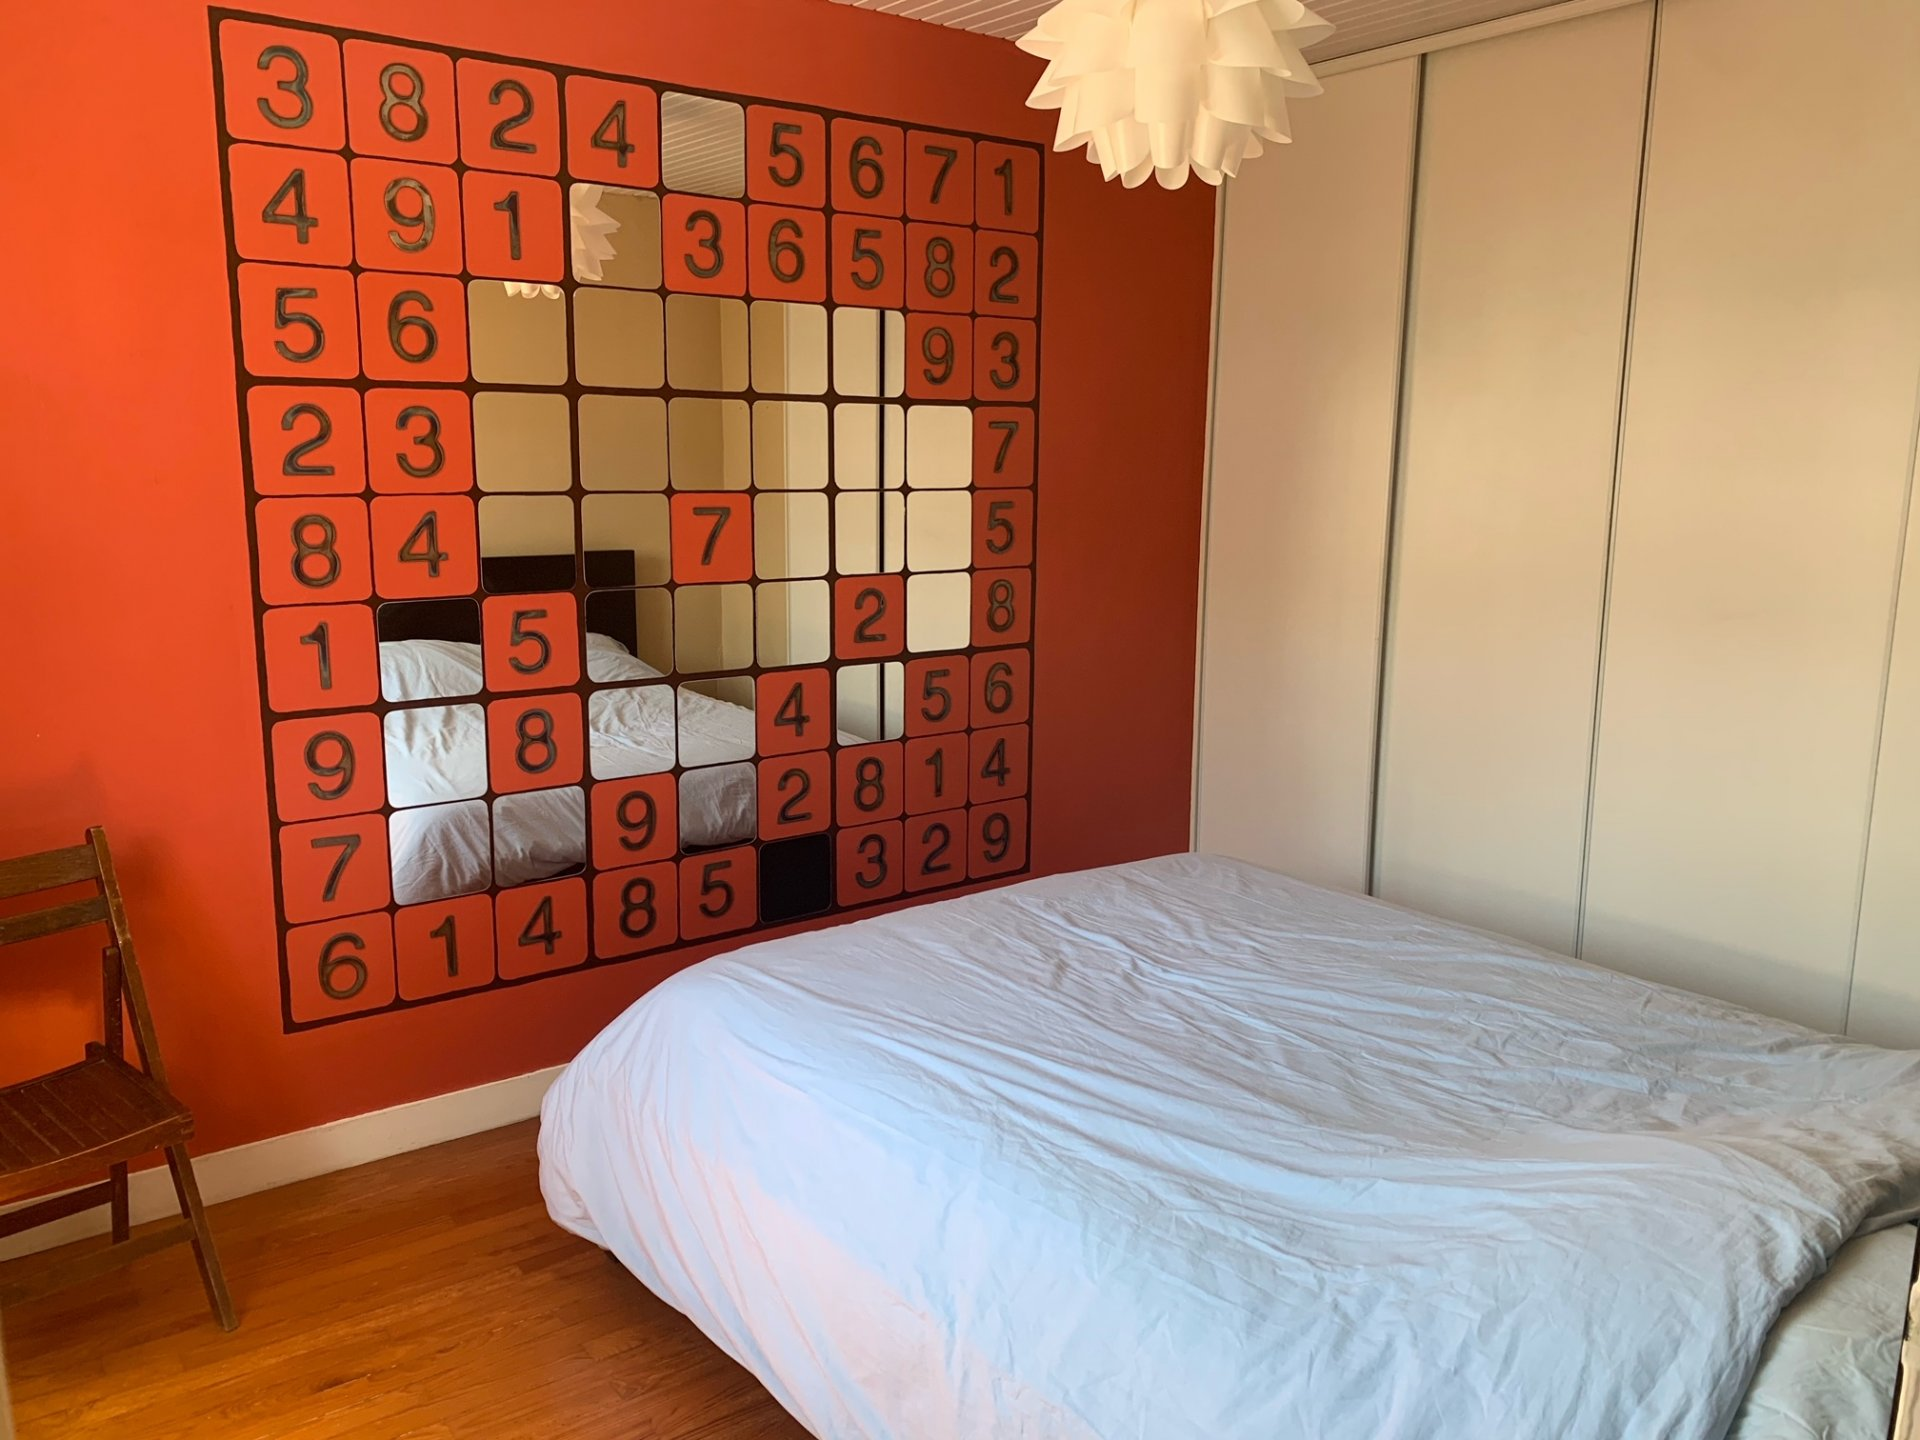 A VENDRE, Morlaix, appartement 3 pièces